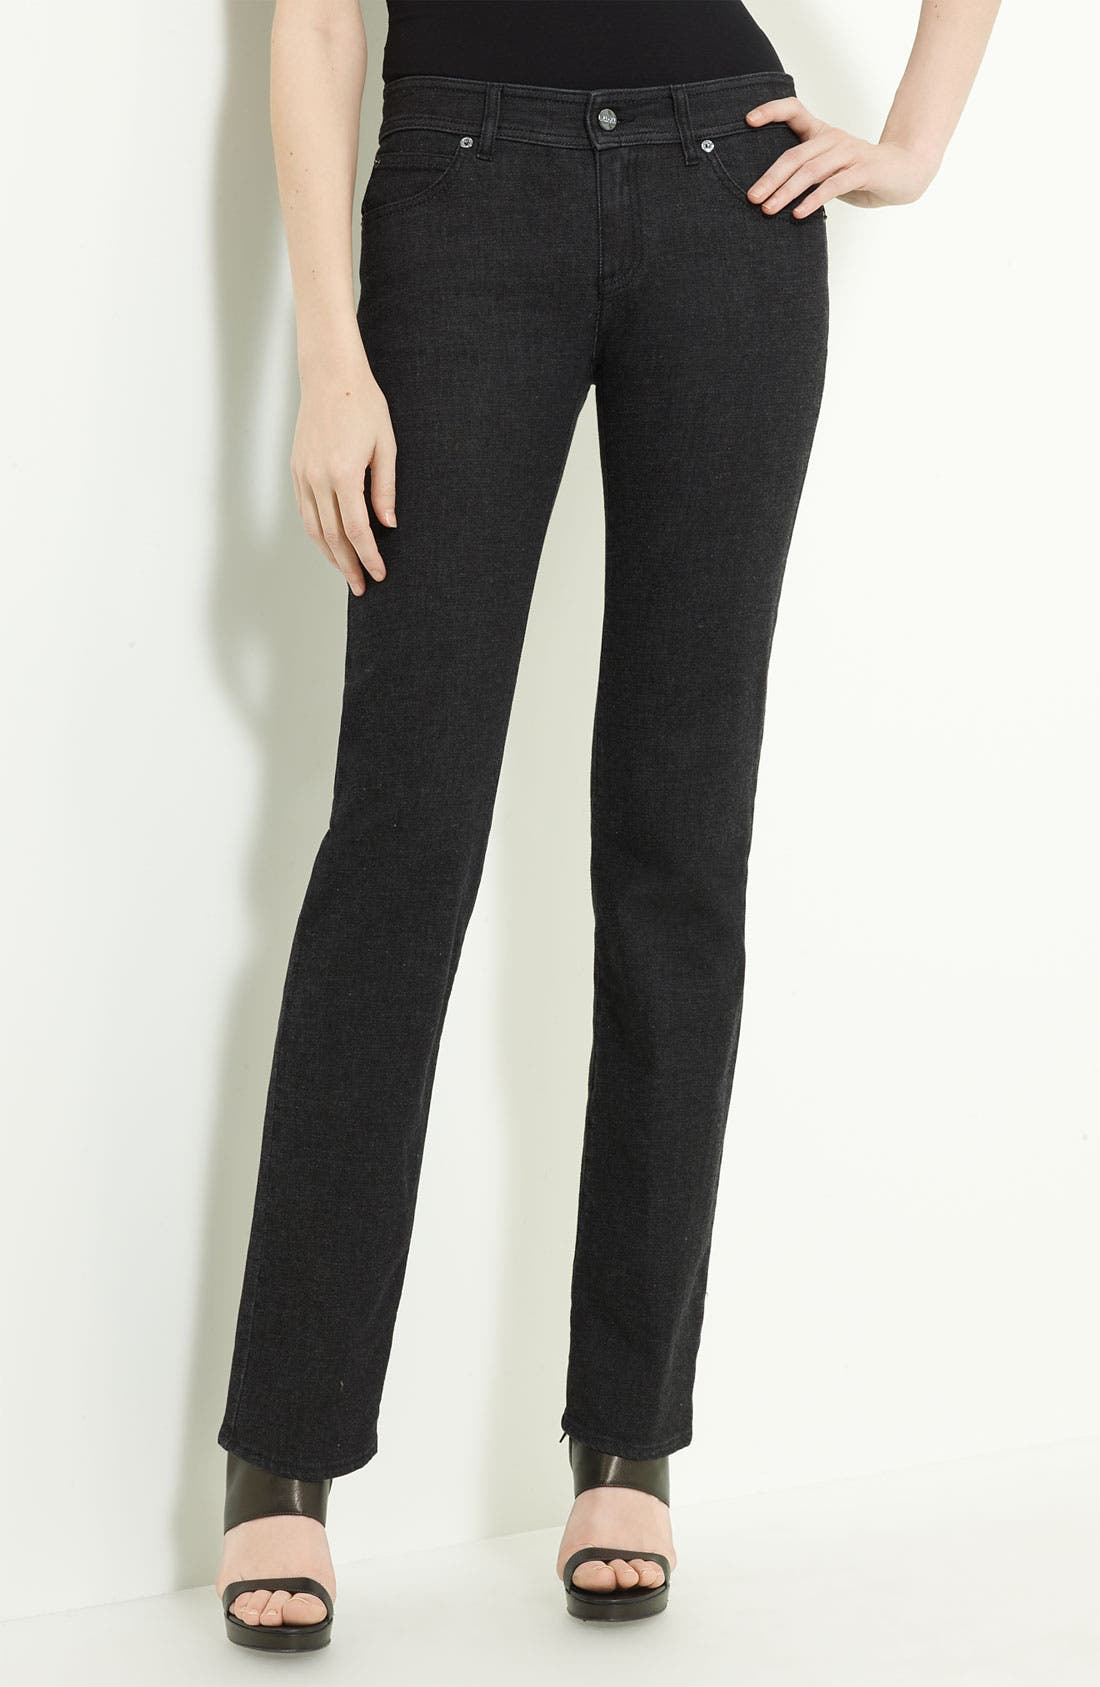 Alternate Image 1 Selected - Armani Collezioni Cashmere Stretch Denim Jeans